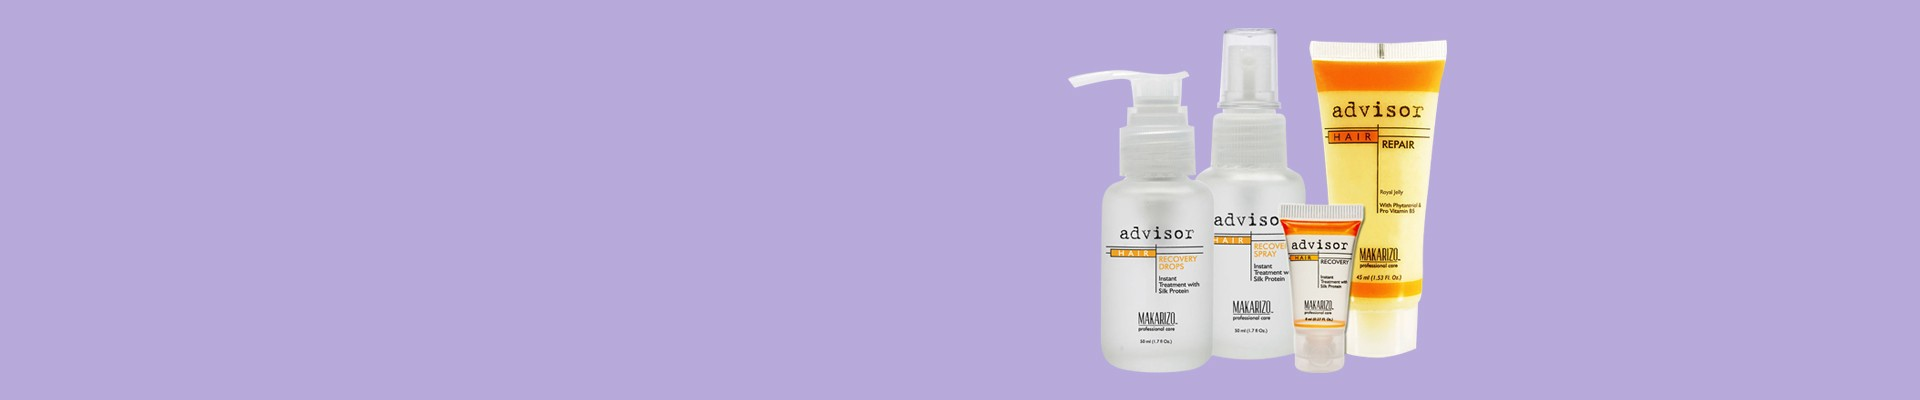 Jual Minyak Rambut Pomade / Vitamin & Serum Rambut